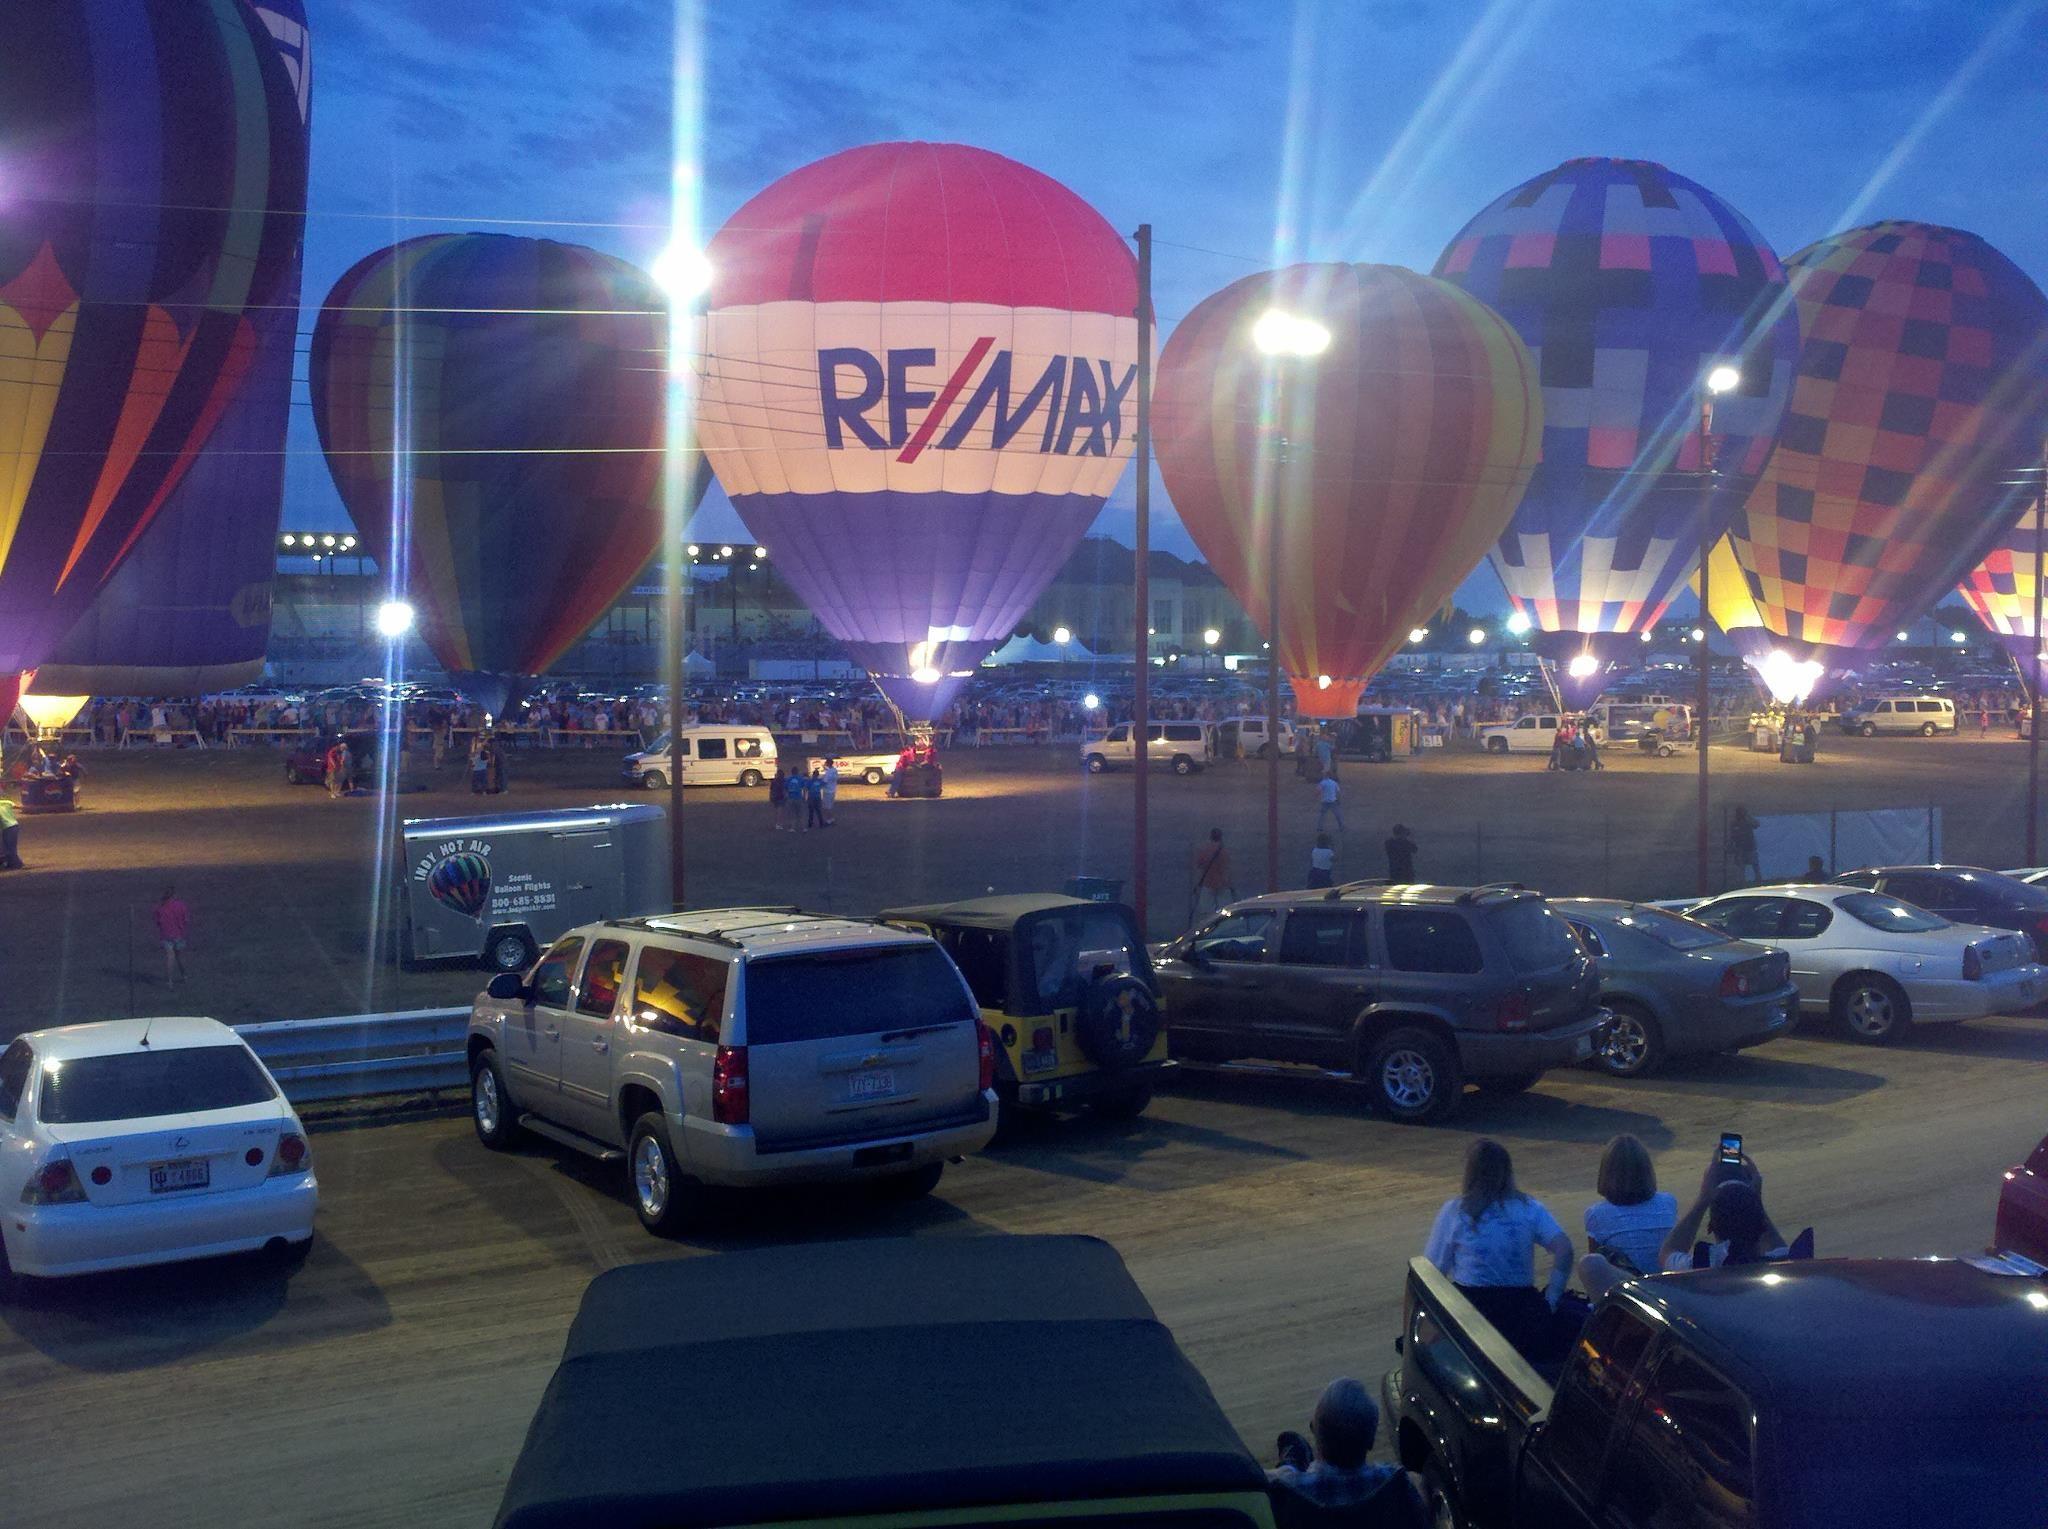 The night balloon glow... an amazing site!